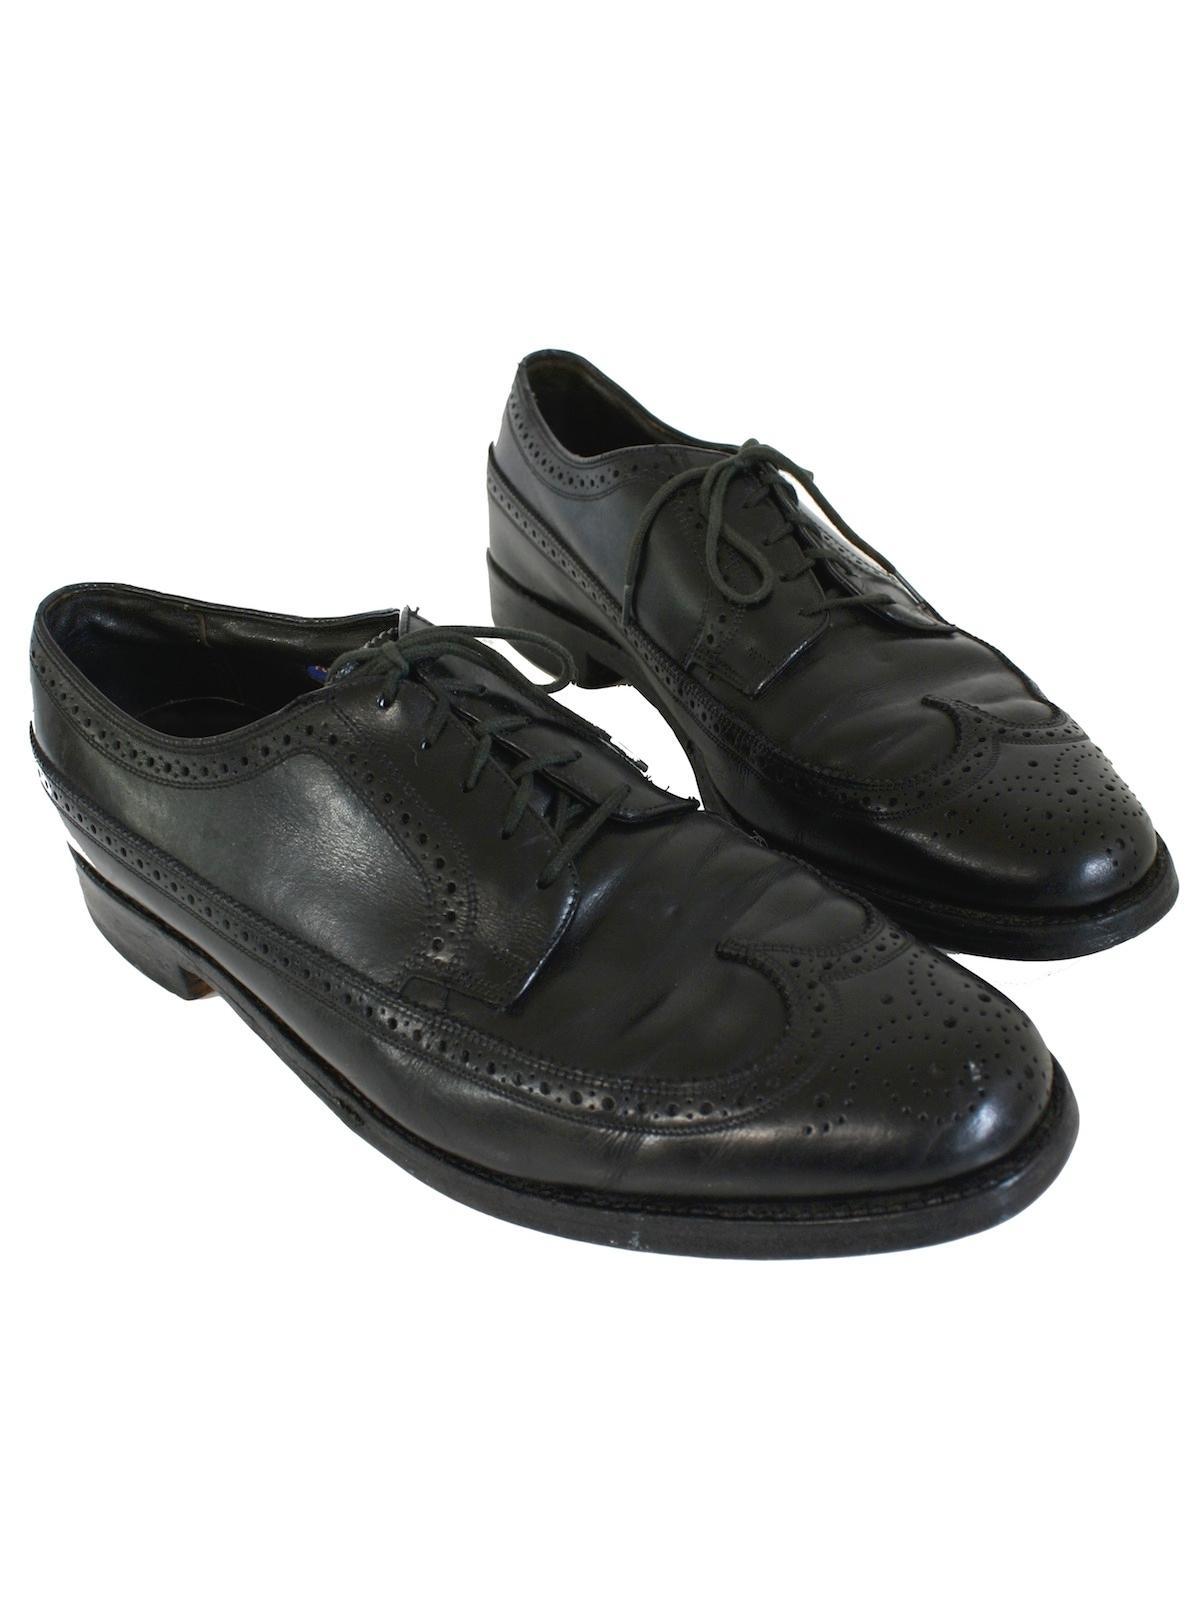 387aa83f8cf30 1960's Florsheim Mens Wing Tip Shoes